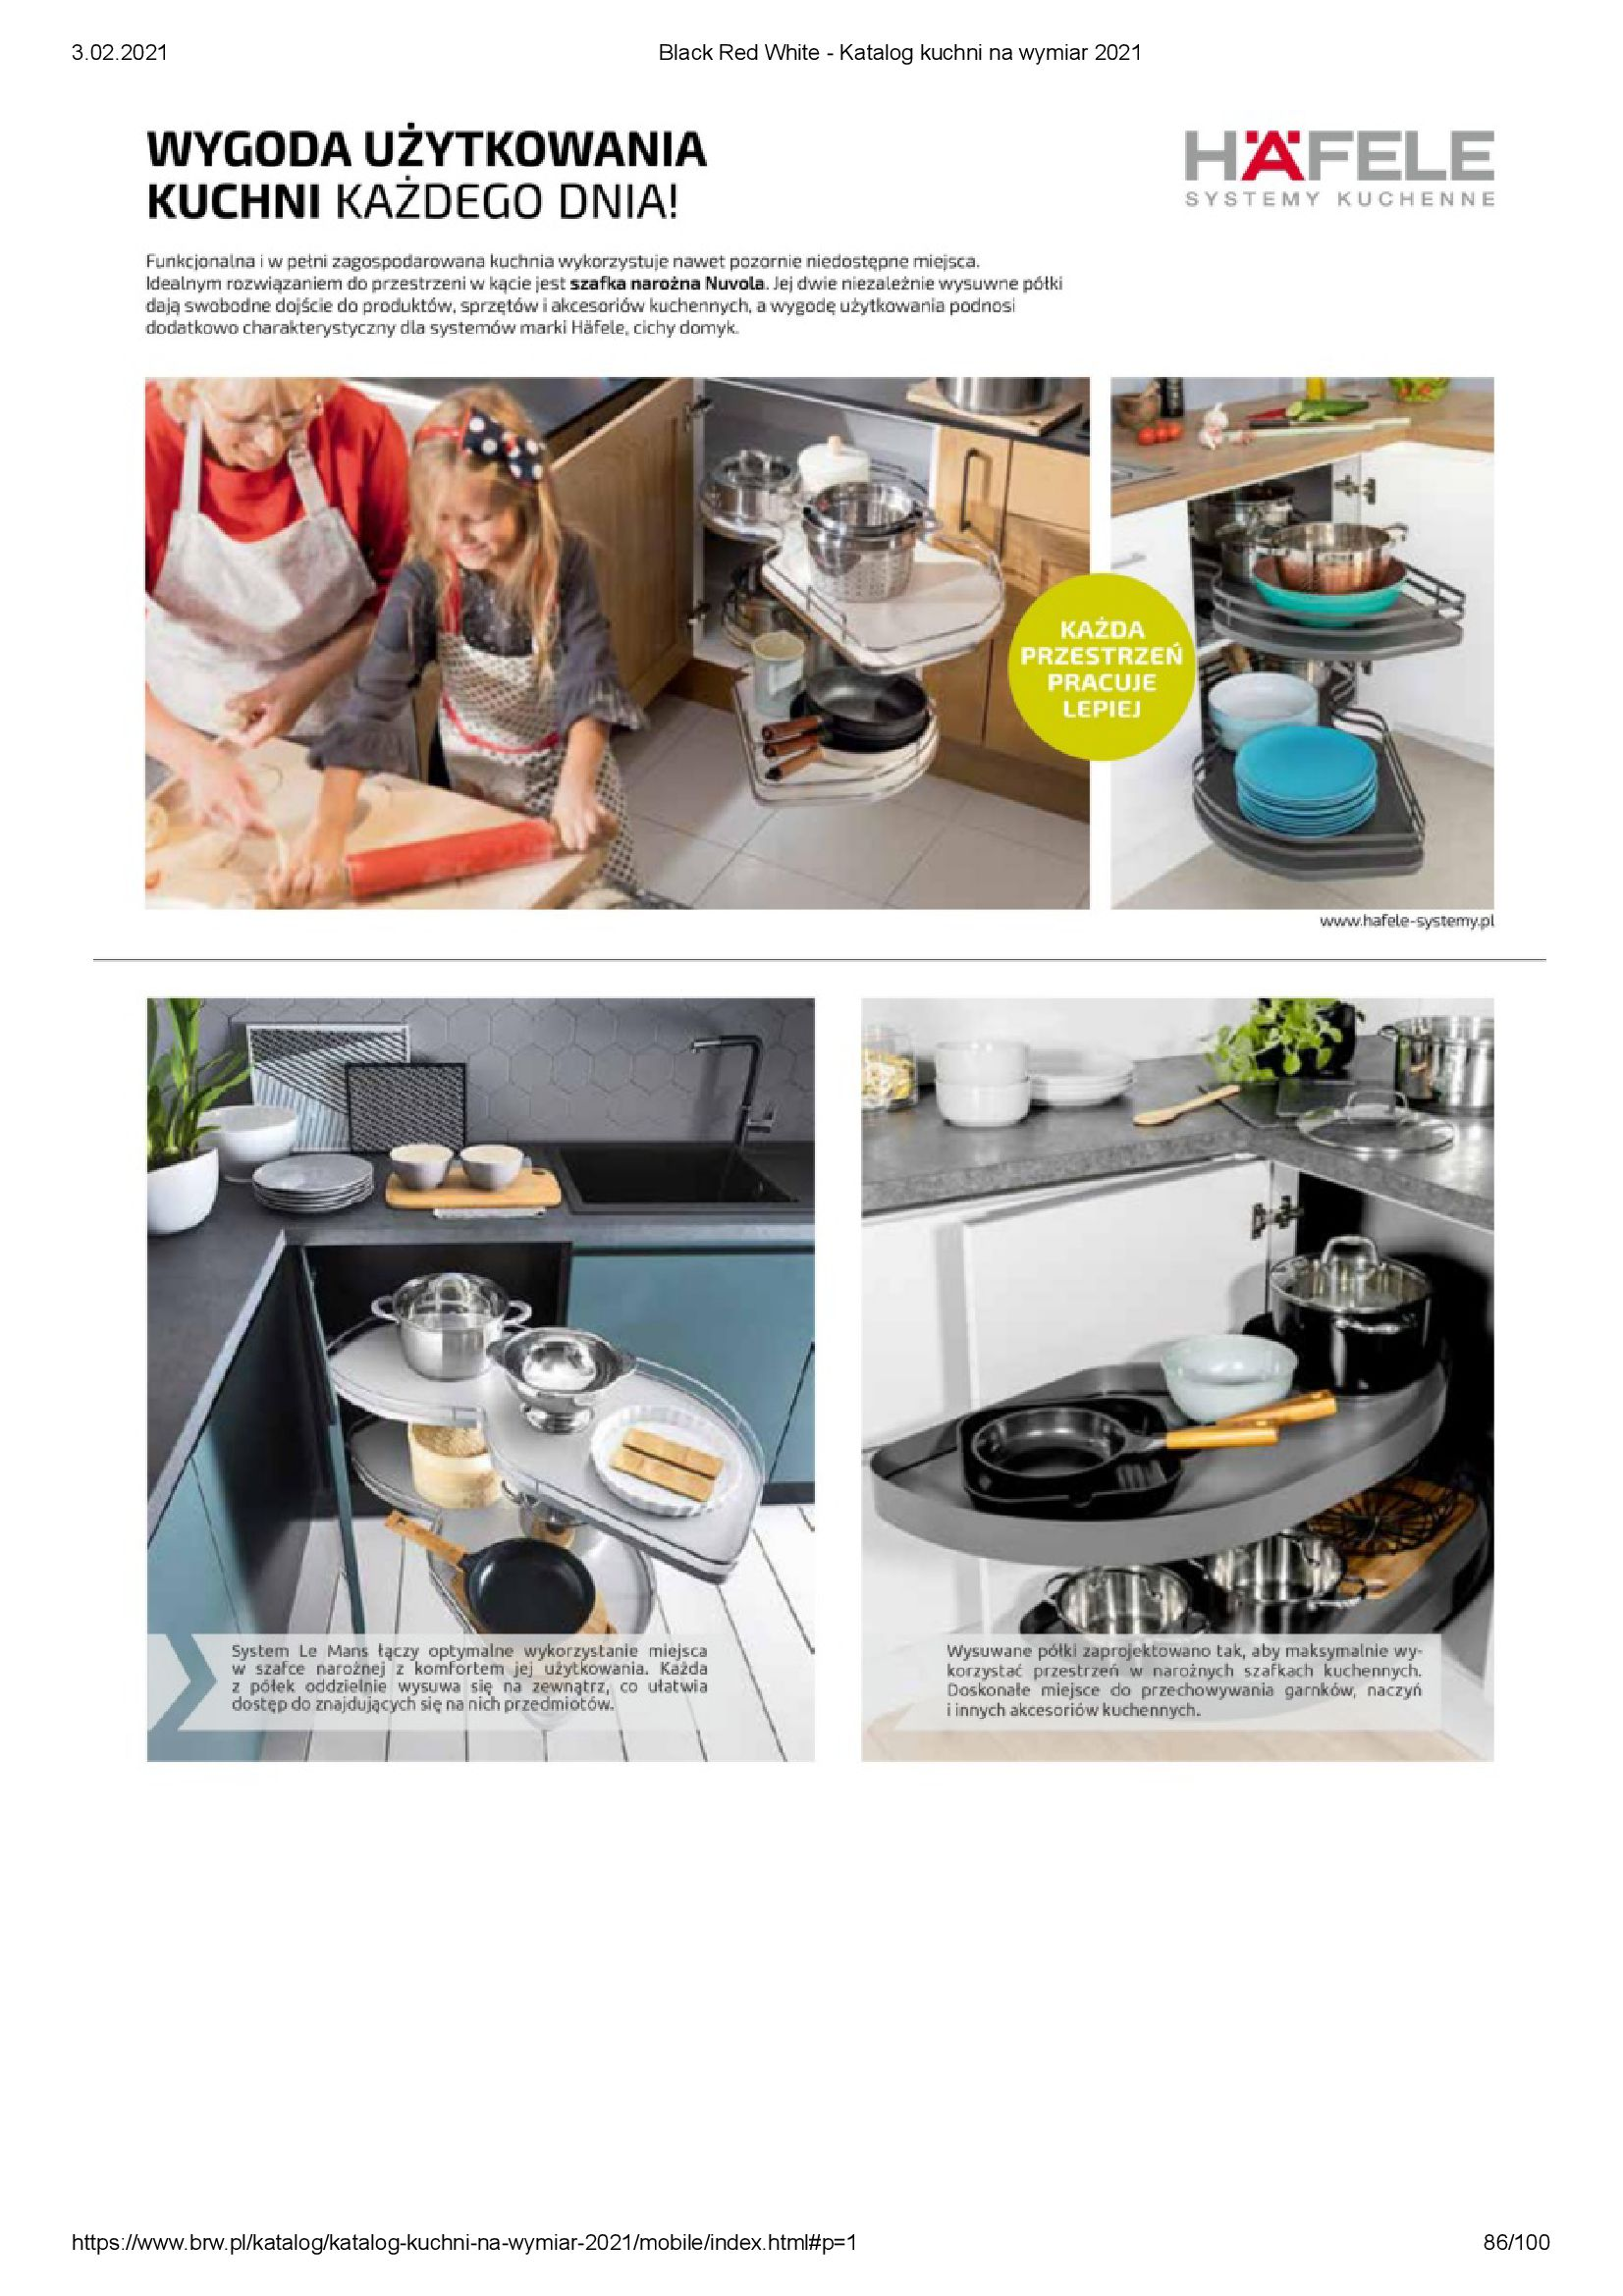 Gazetka Black Red White: Katalog - Kuchnie na wymiar Senso Kitchens 2021 2021-01-01 page-86